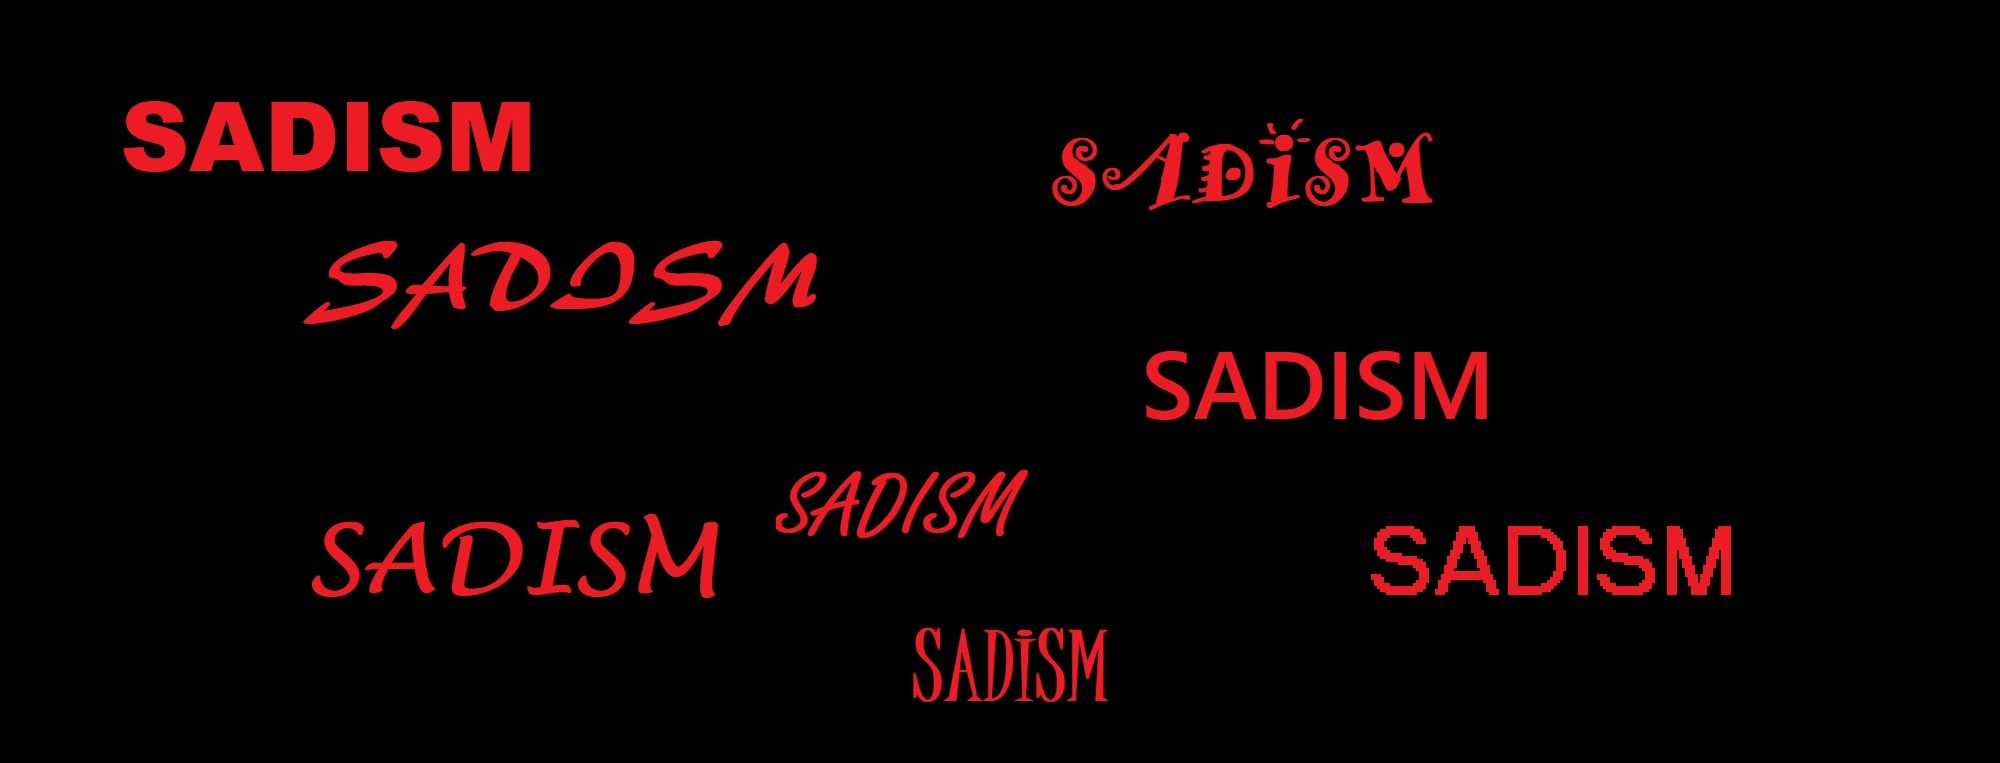 SADISM